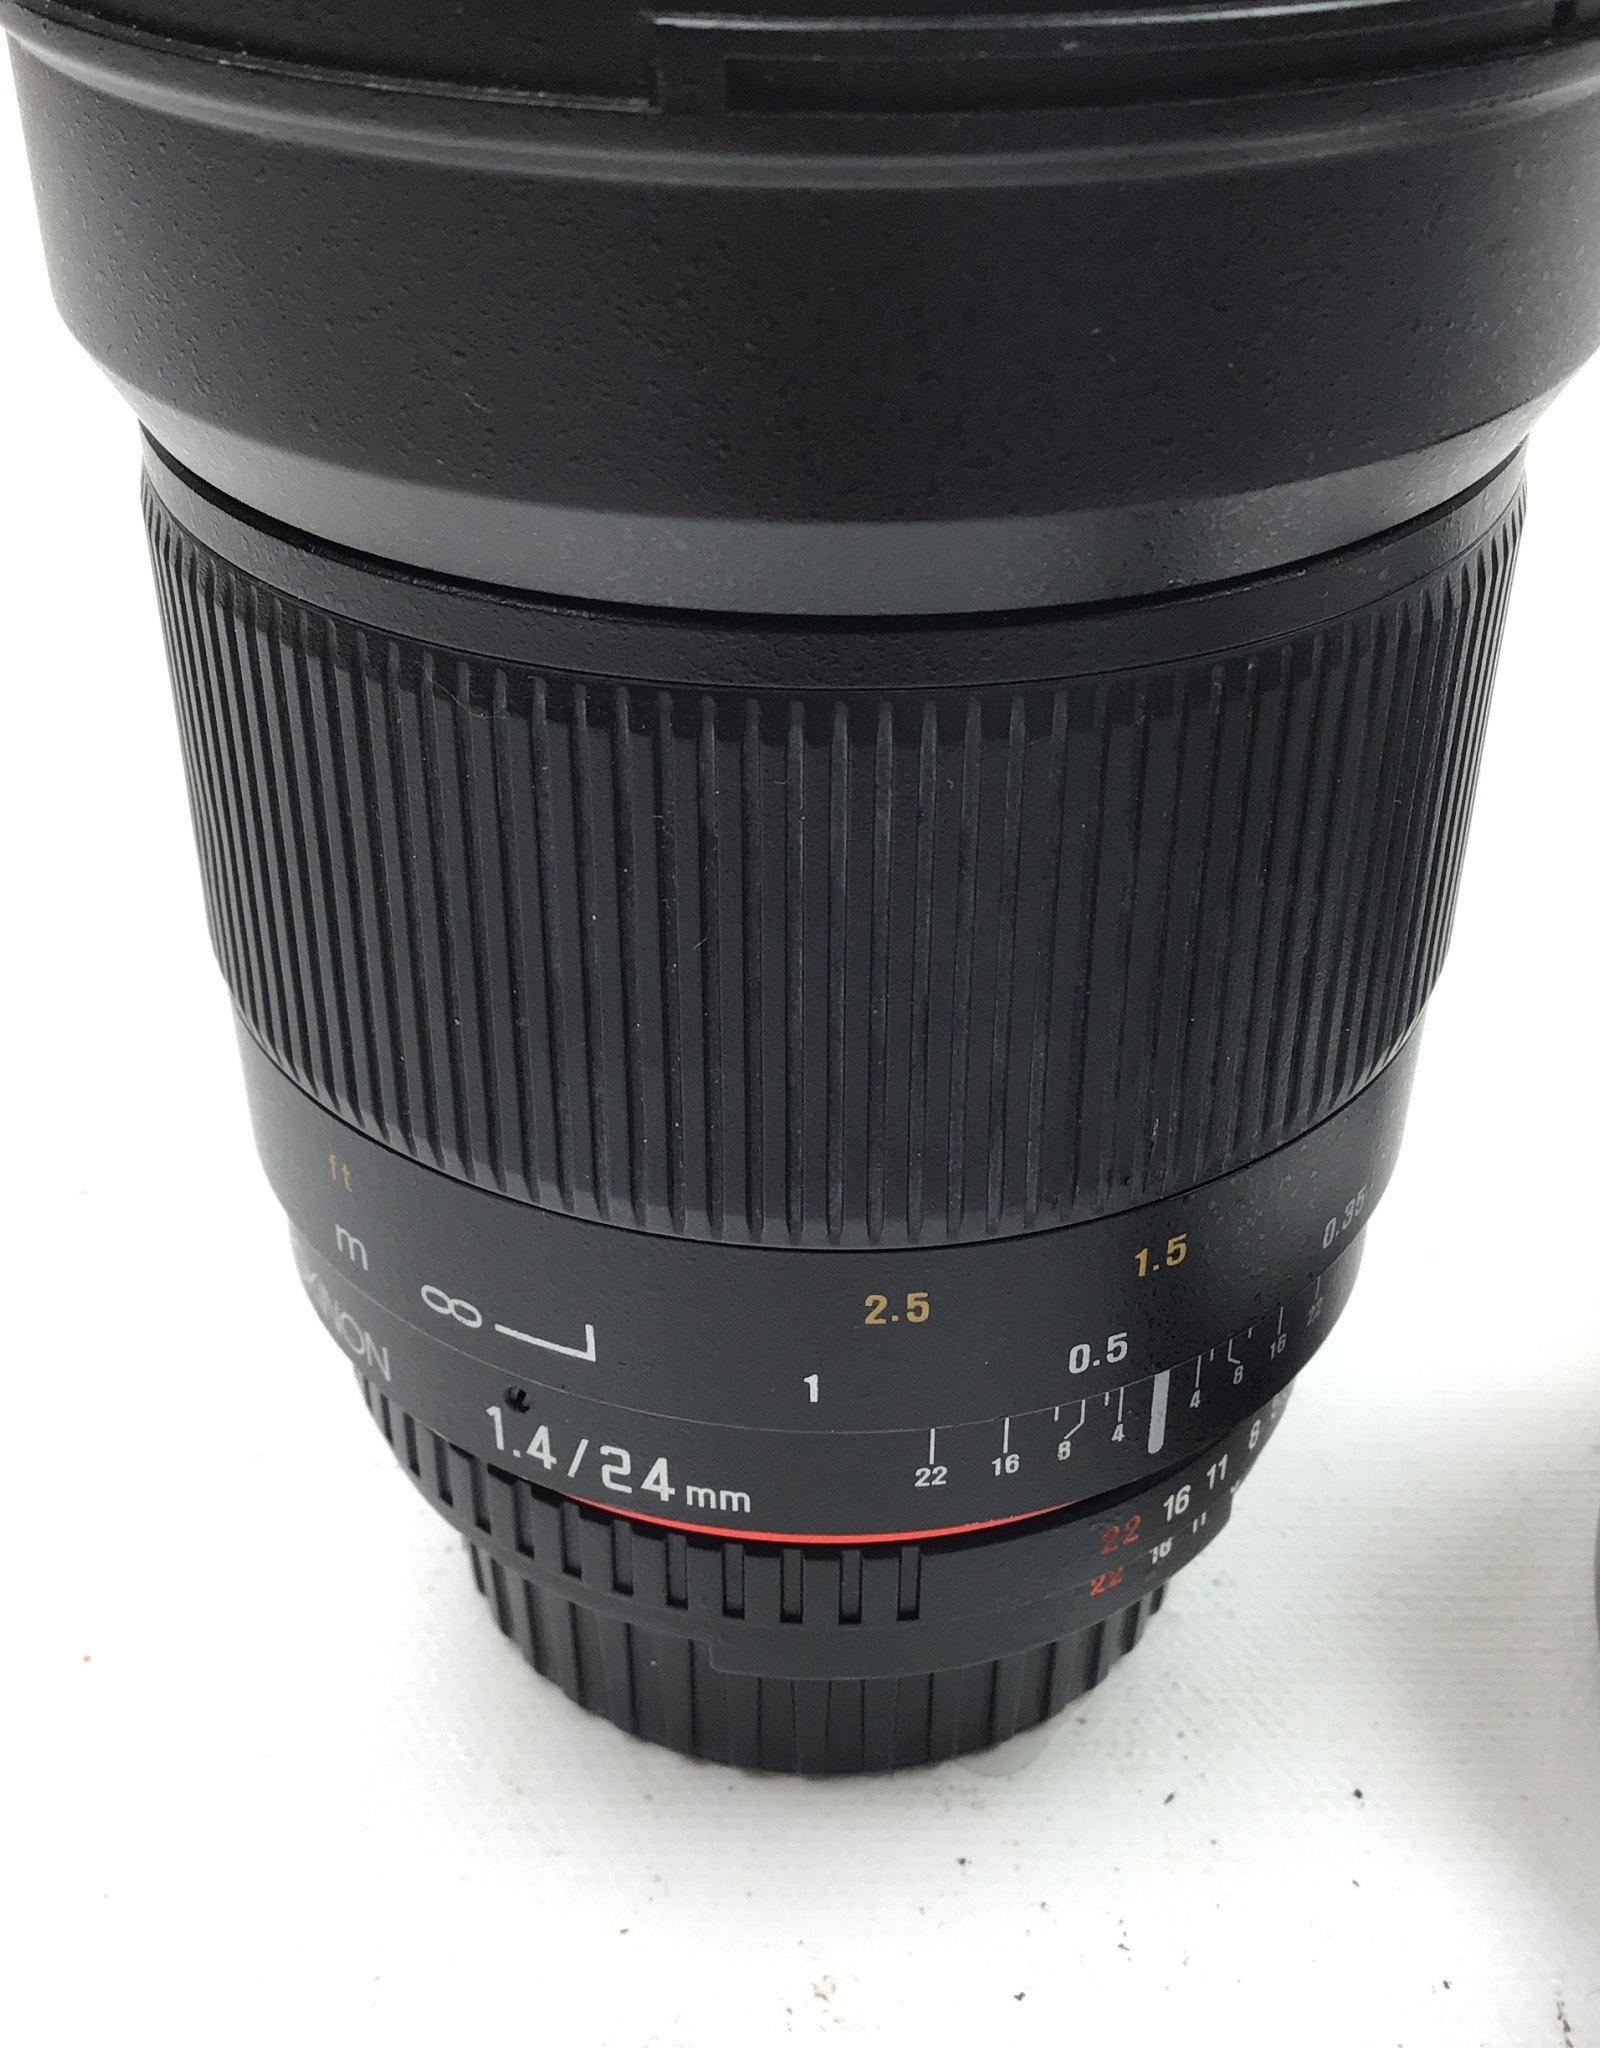 ROKINON Rokinon 24mm f1.4 ED AS IF UMC Lens For Nikon Used Good